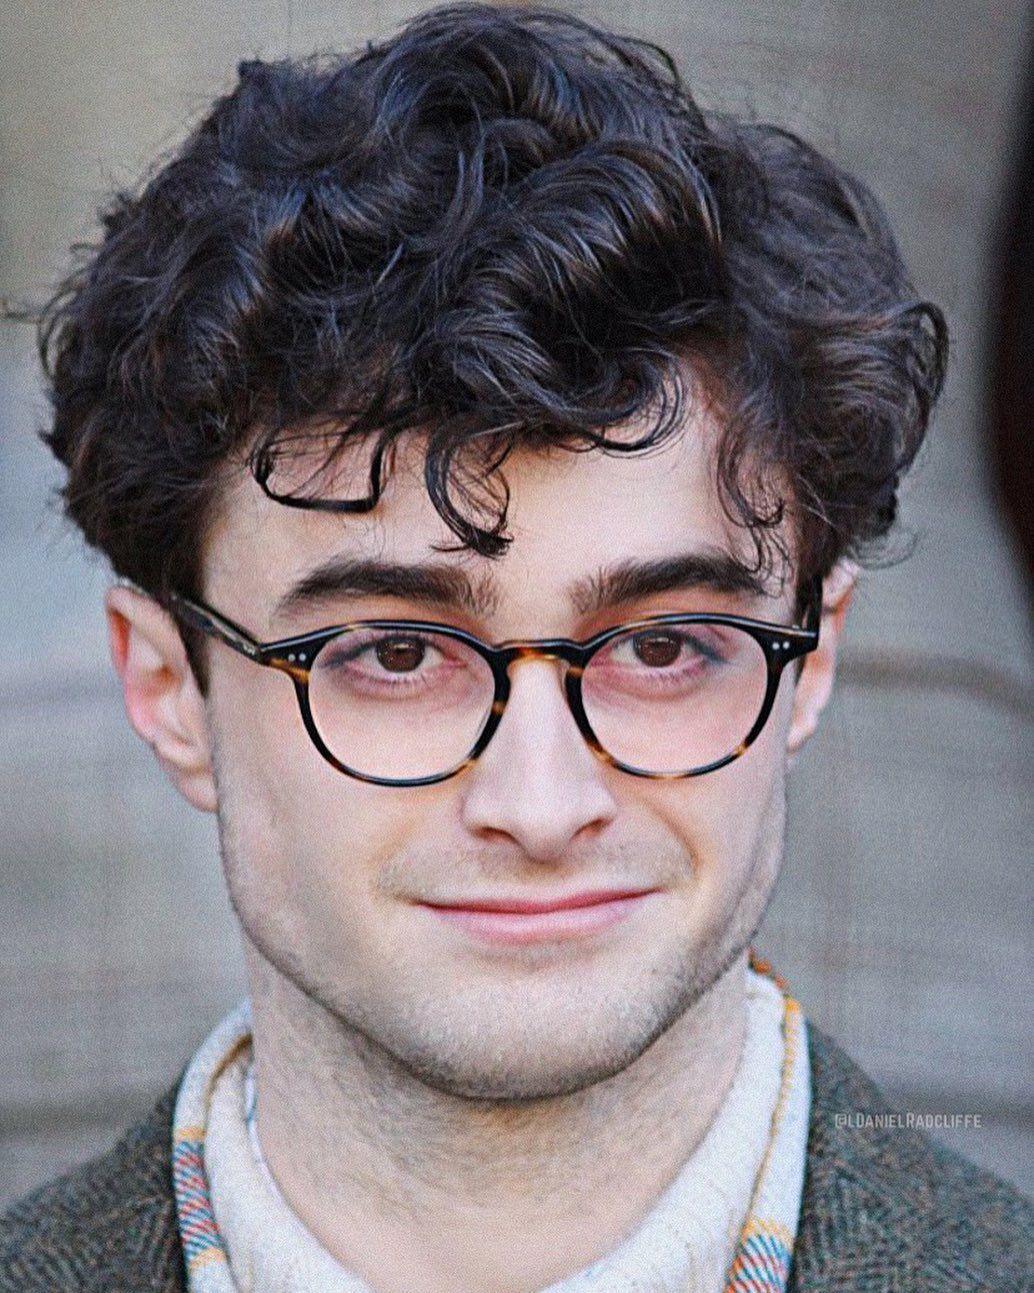 Daniel Radcliffe On Instagram Curly Hair Daniel Radcliffe Daniel Radcliffe Harry Potter Harry Potter Actors